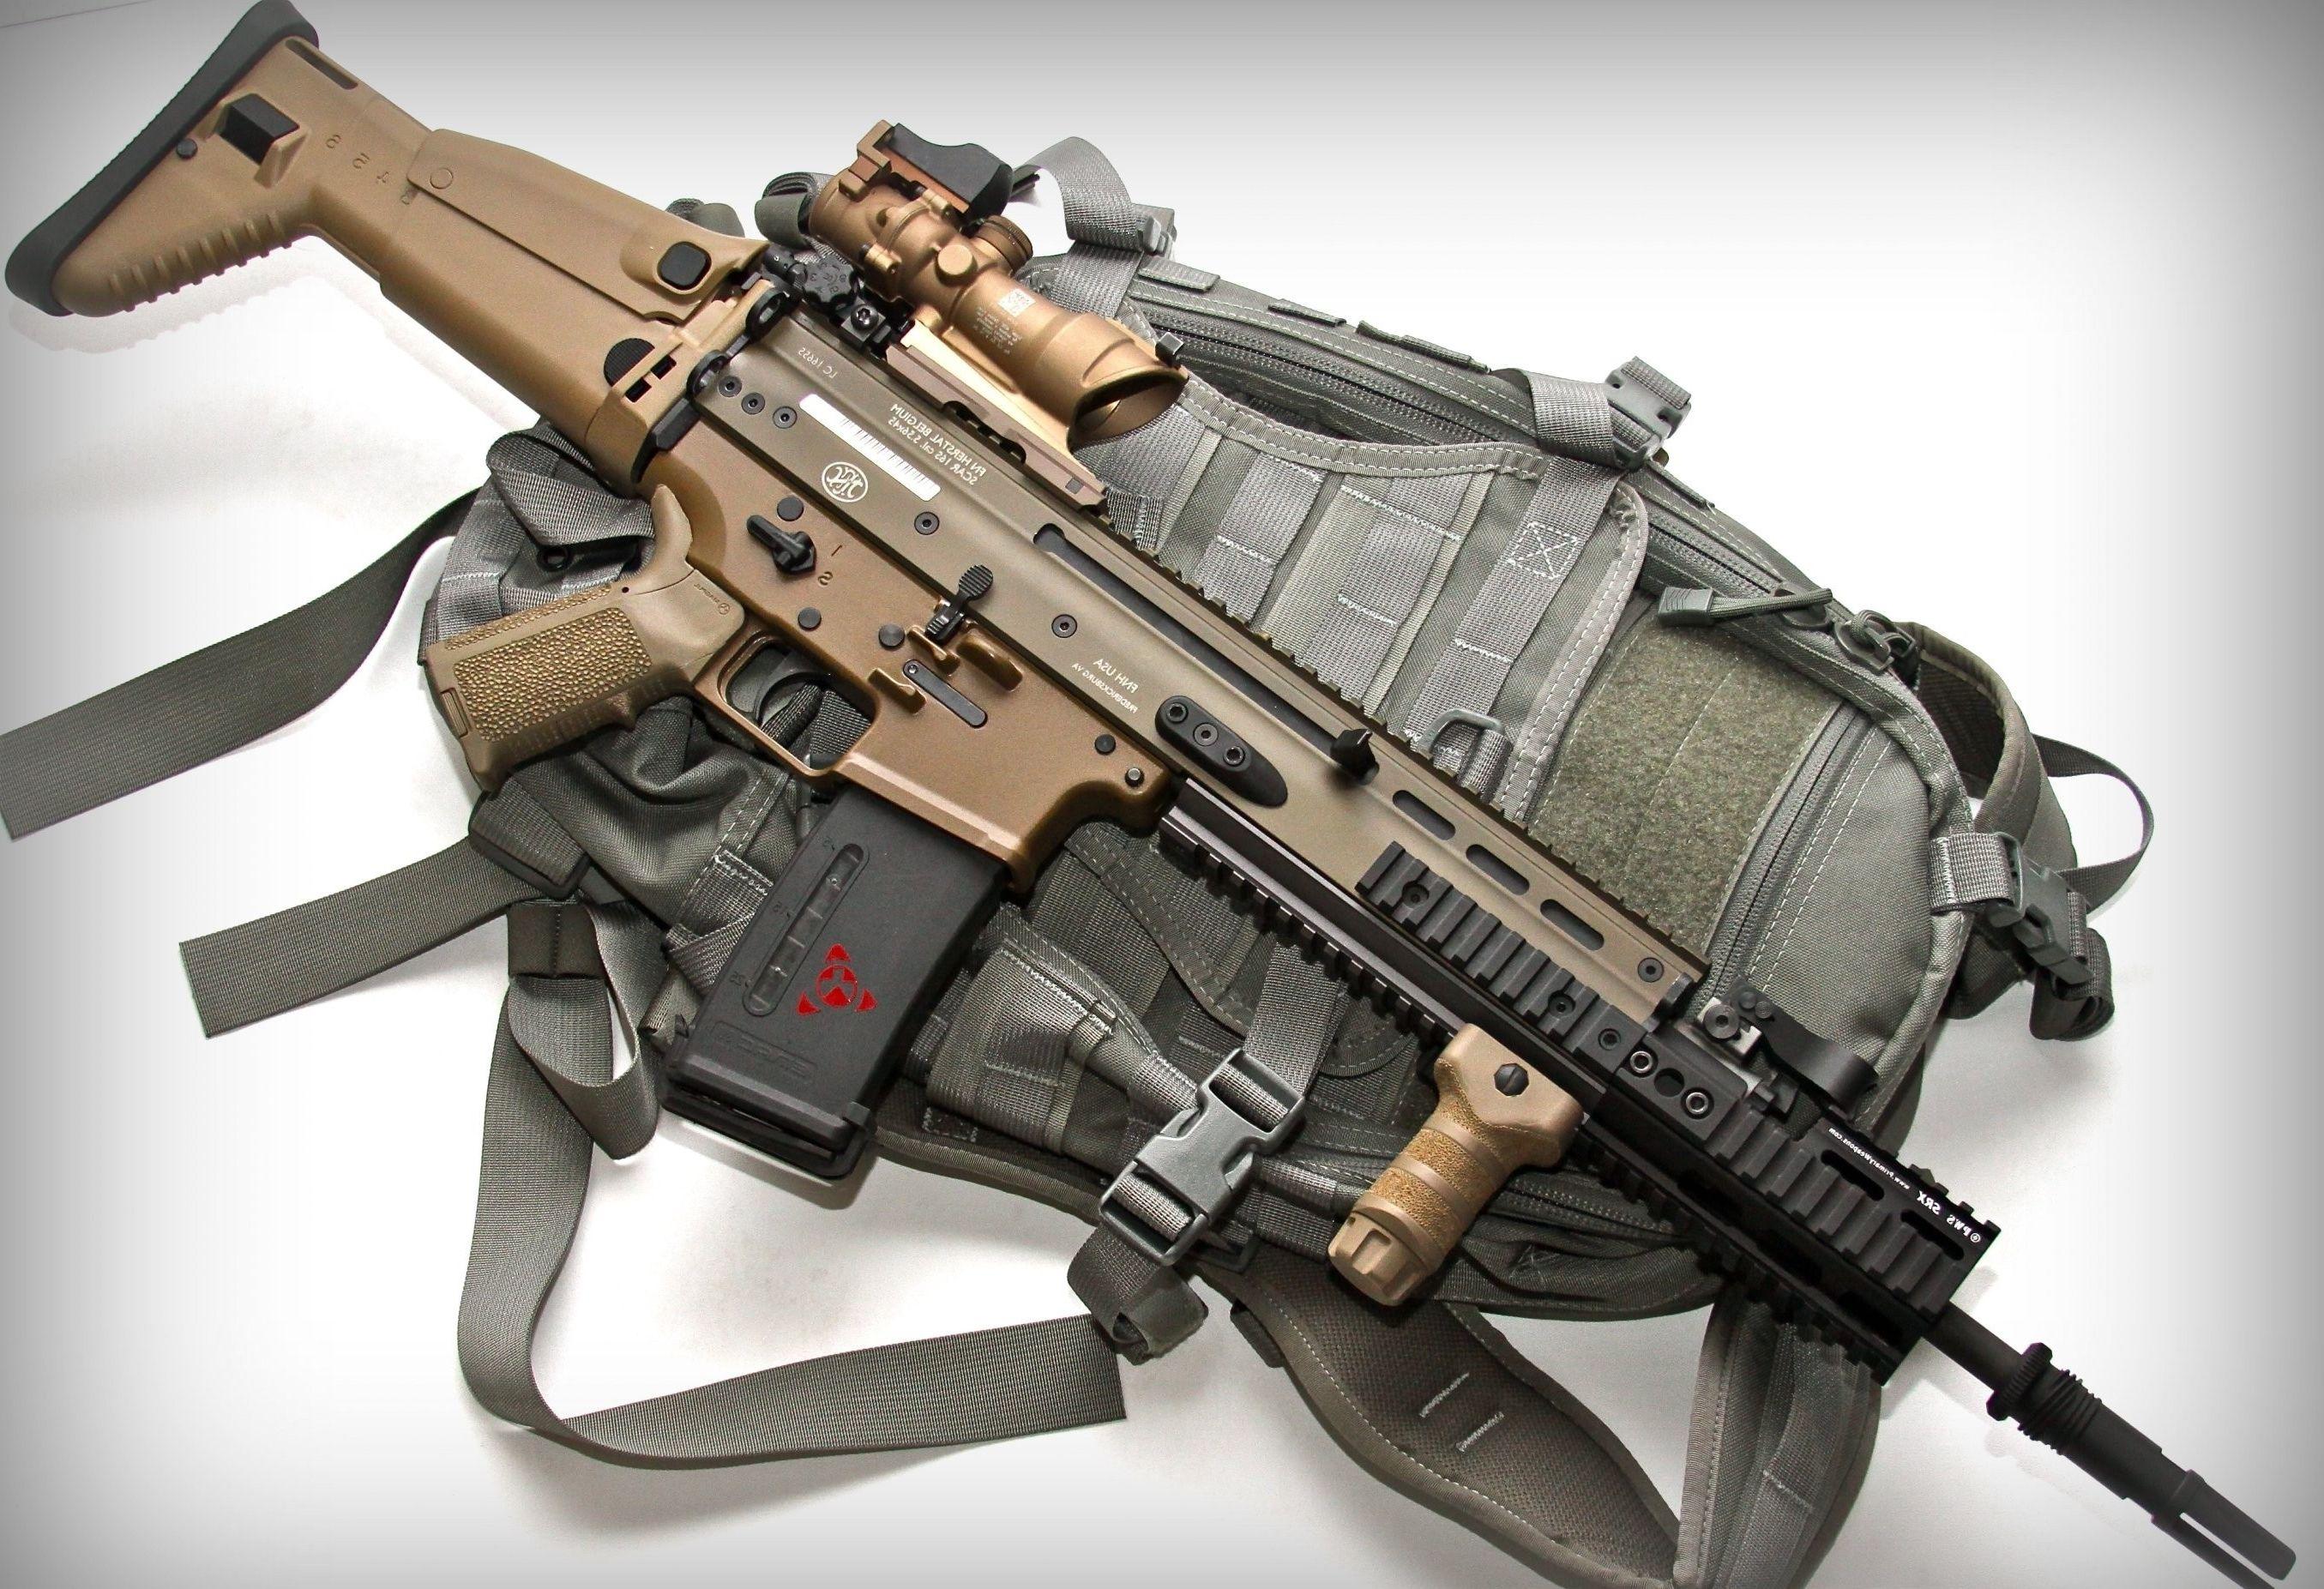 Professional Military Machine Gun Wallpapers HD